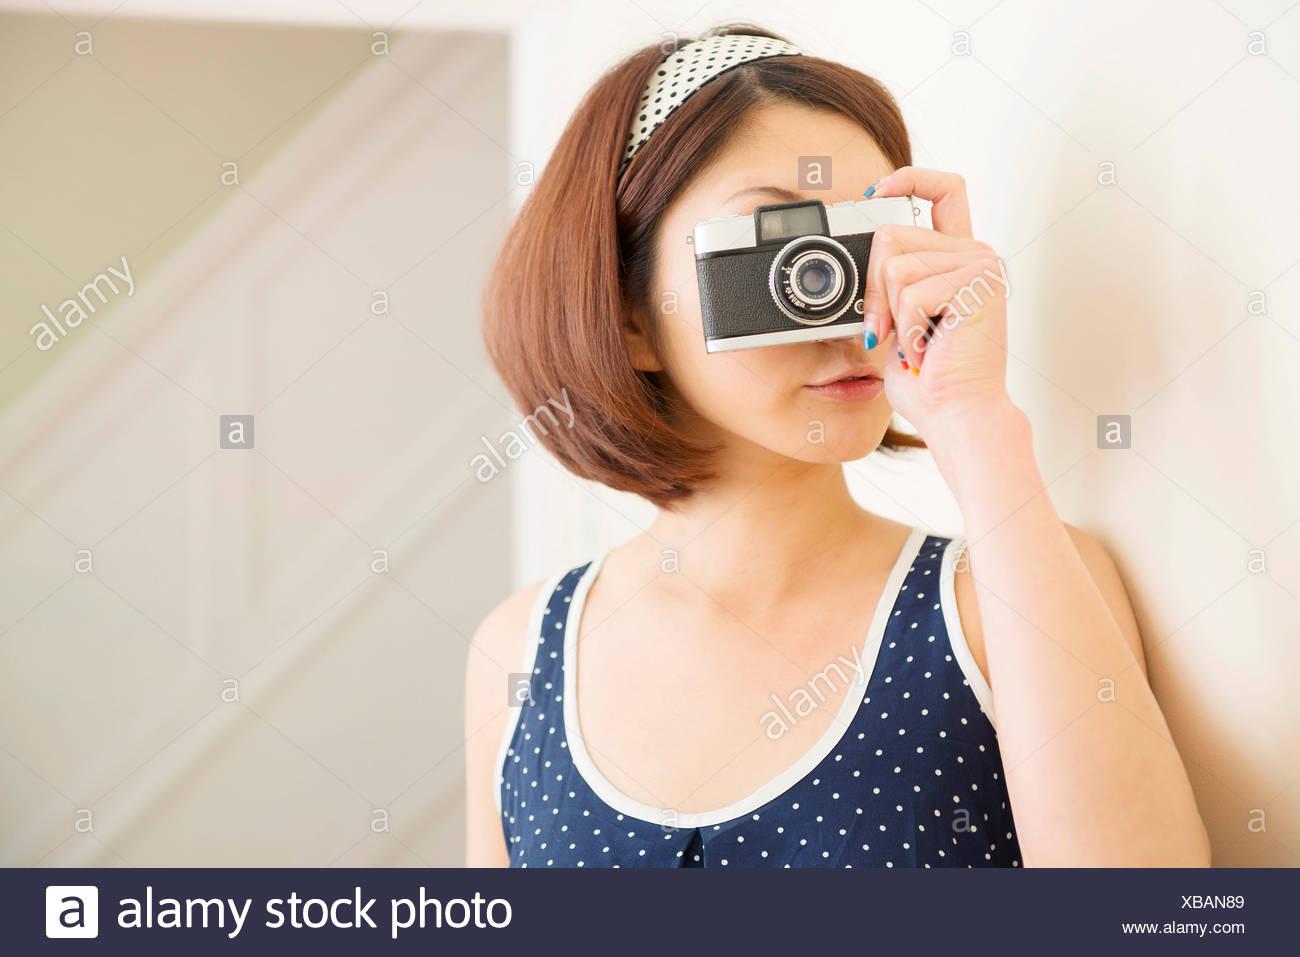 Woman taking photograph - Stock Image